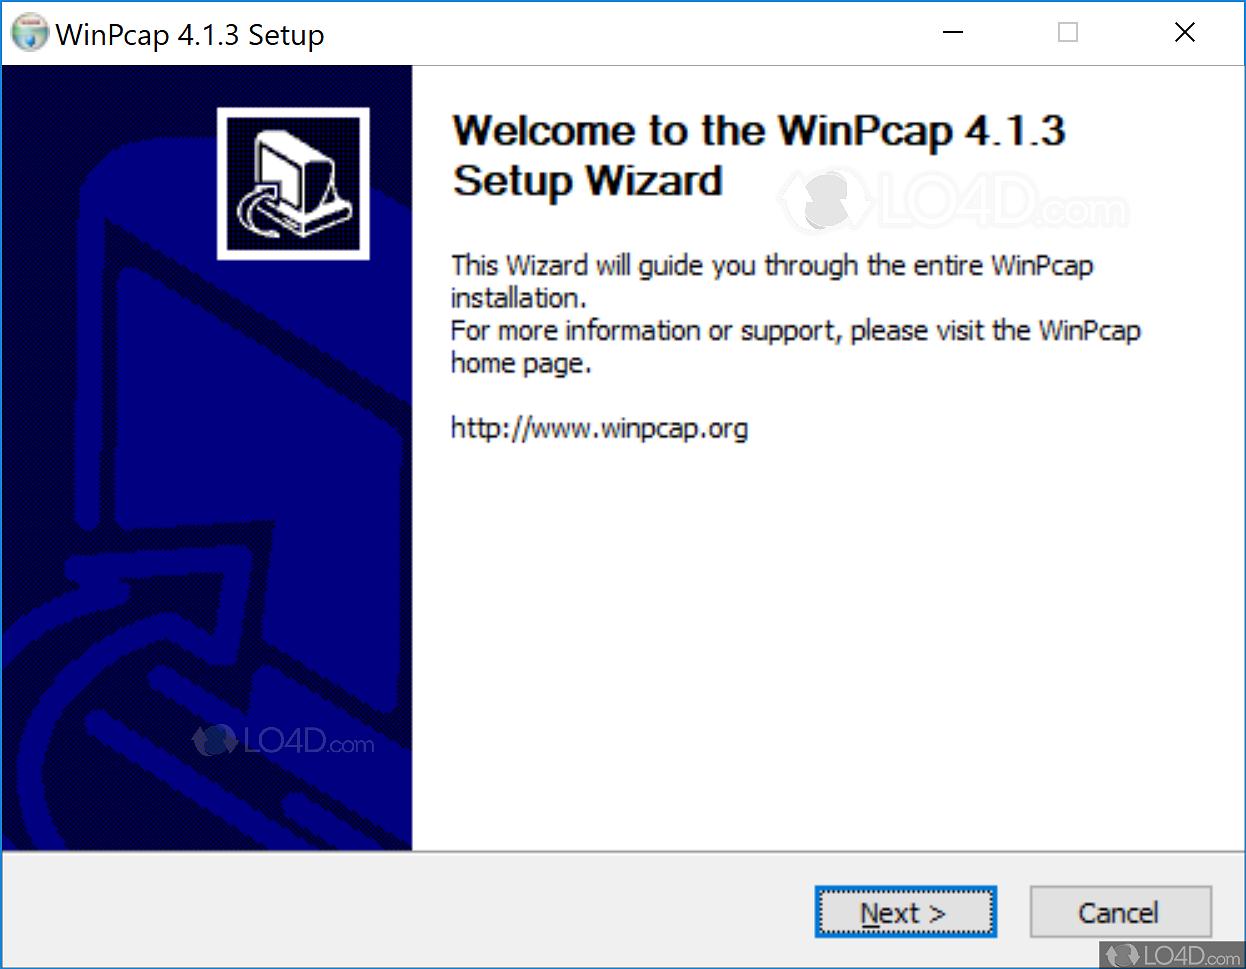 winpcap 4.0.1